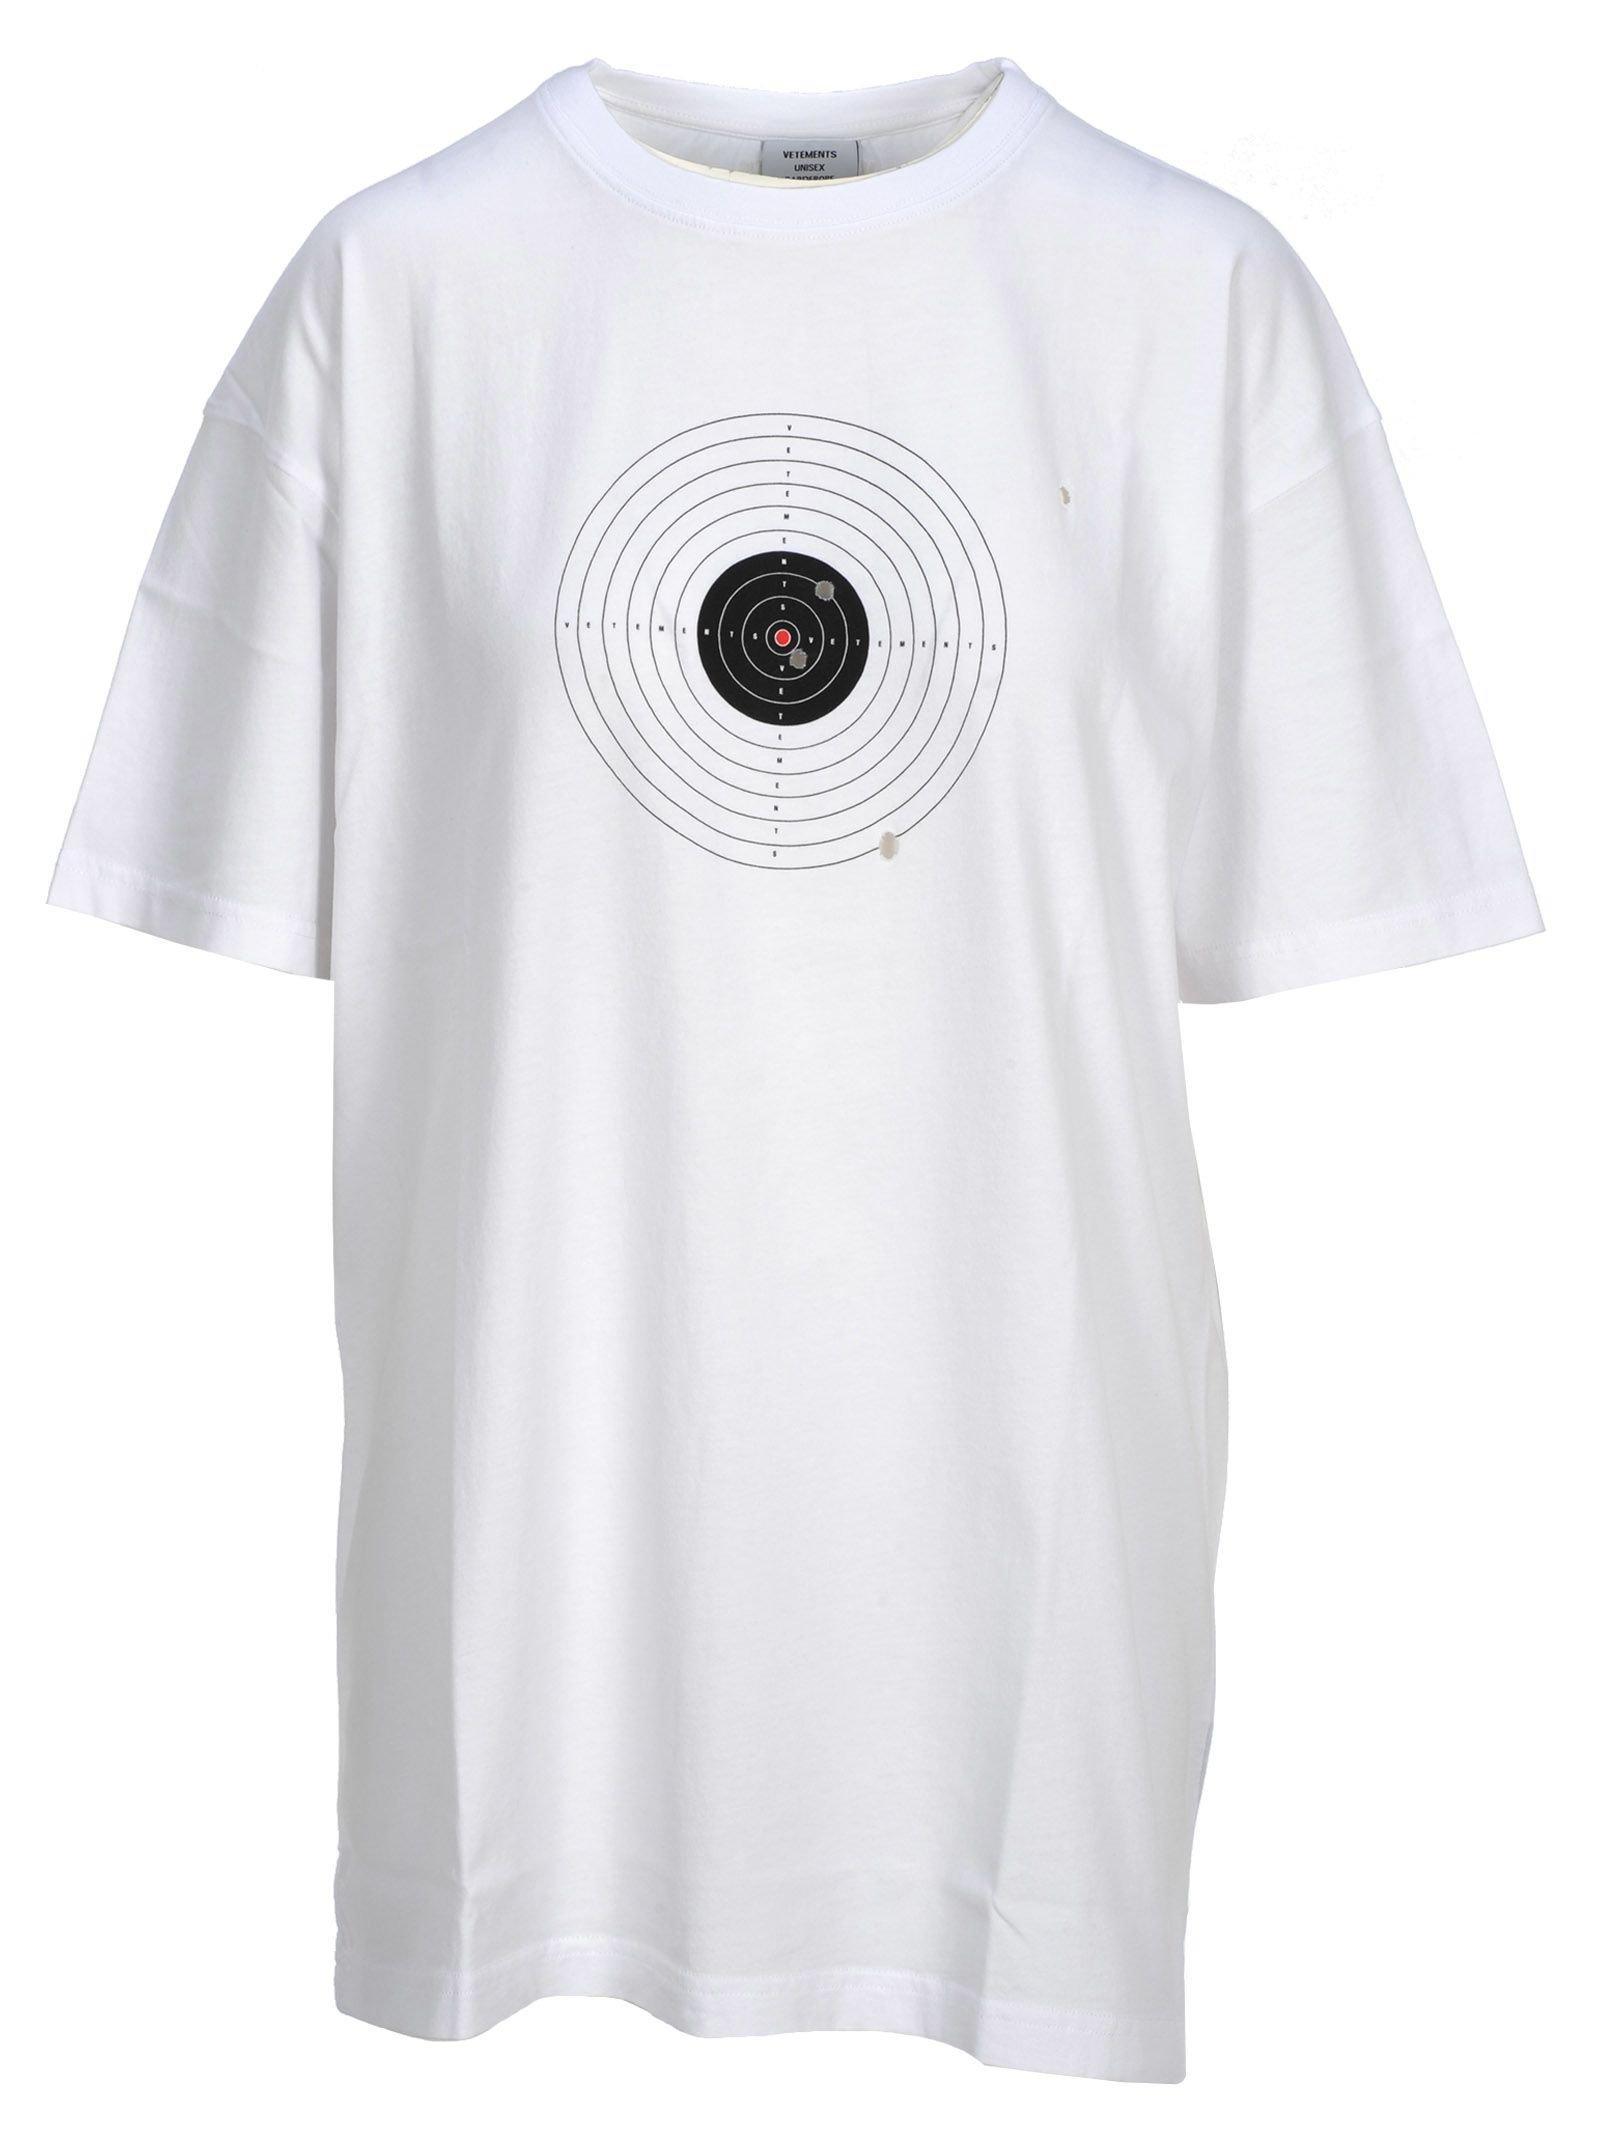 Vetements Vetements Target Print T-shirt